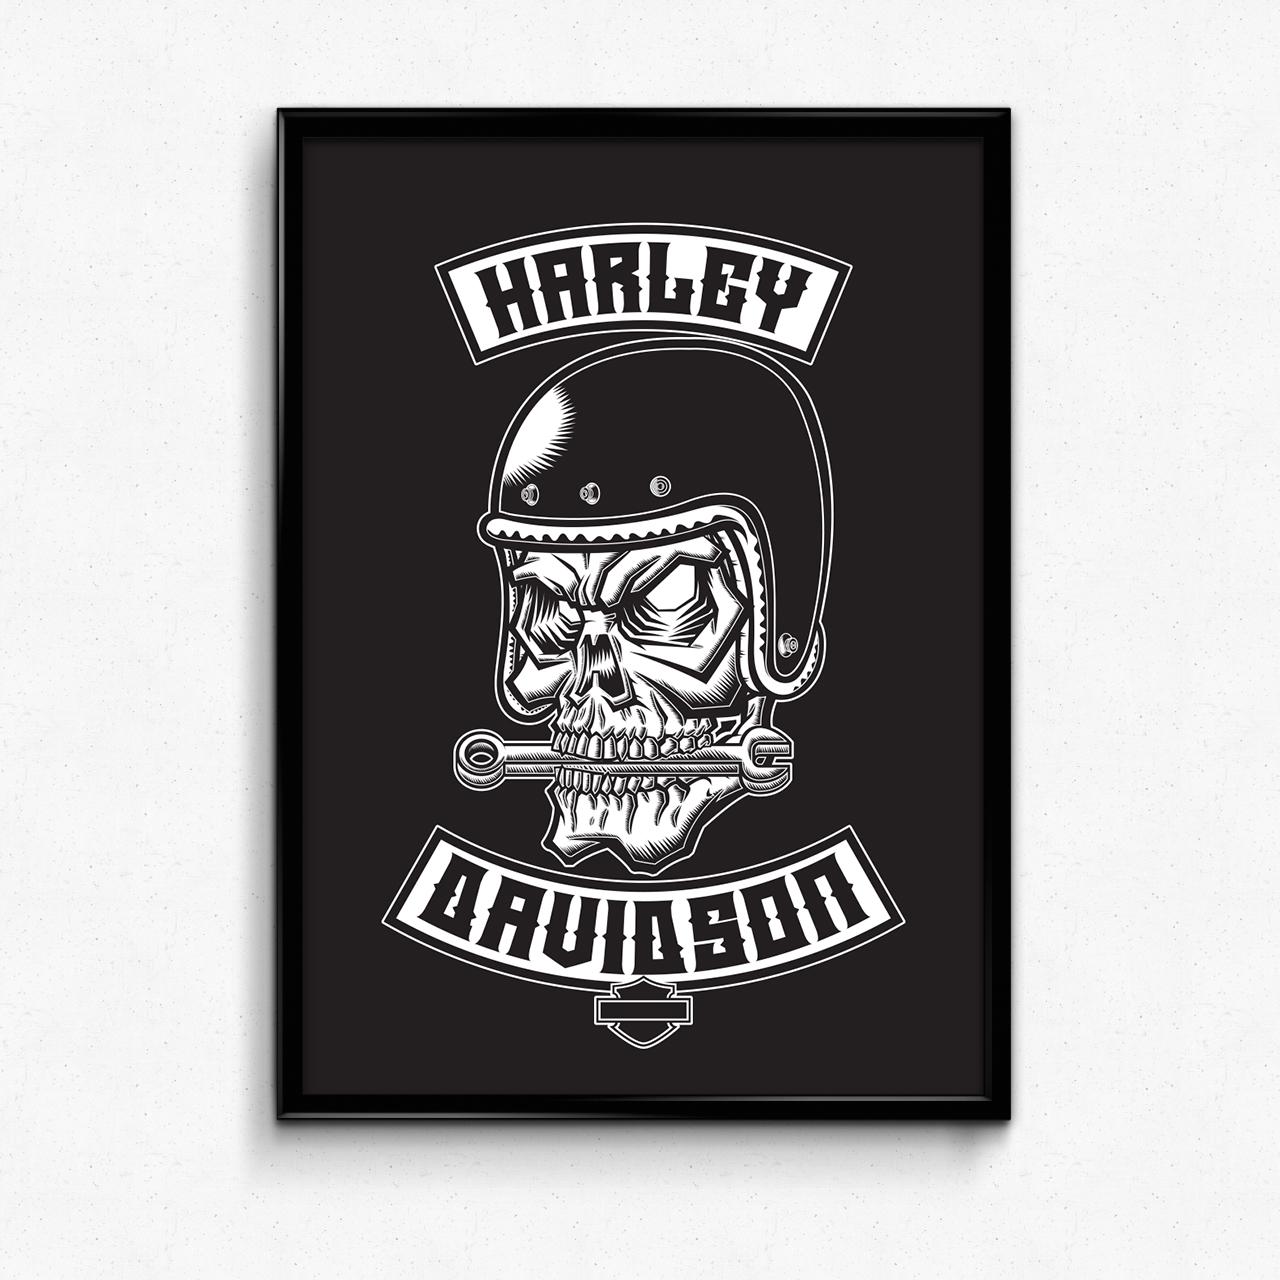 harleydavidson-caferacer-skull-motorcycle-harleydavidsonart-art-vector-poster-illustration-black-white-orozco-deesign-roberto-artist-posterdesign.jpg